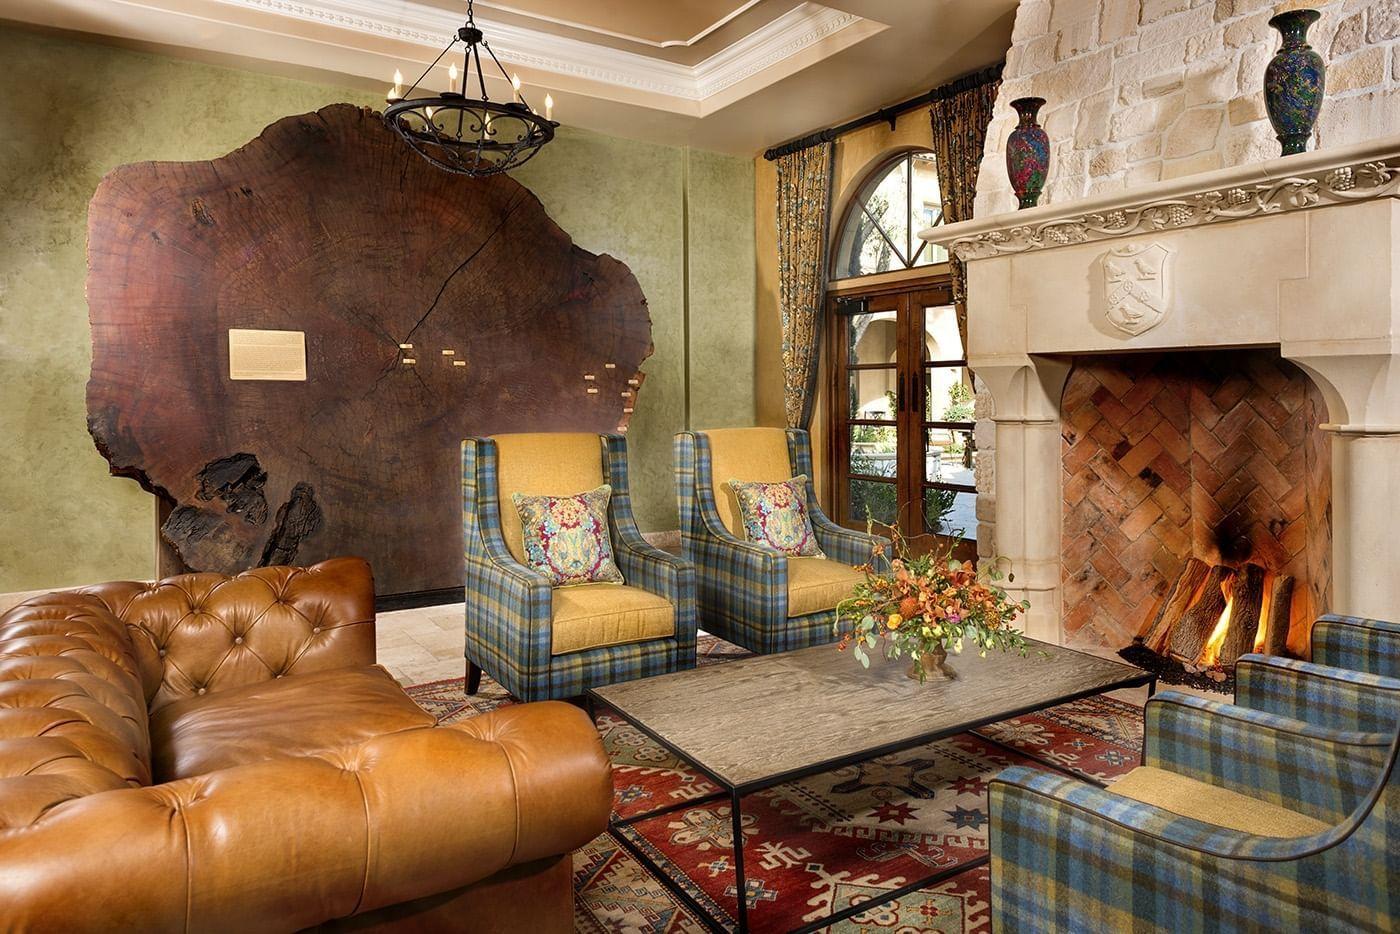 The interior of the Allegretto Vineyard Resort living room style